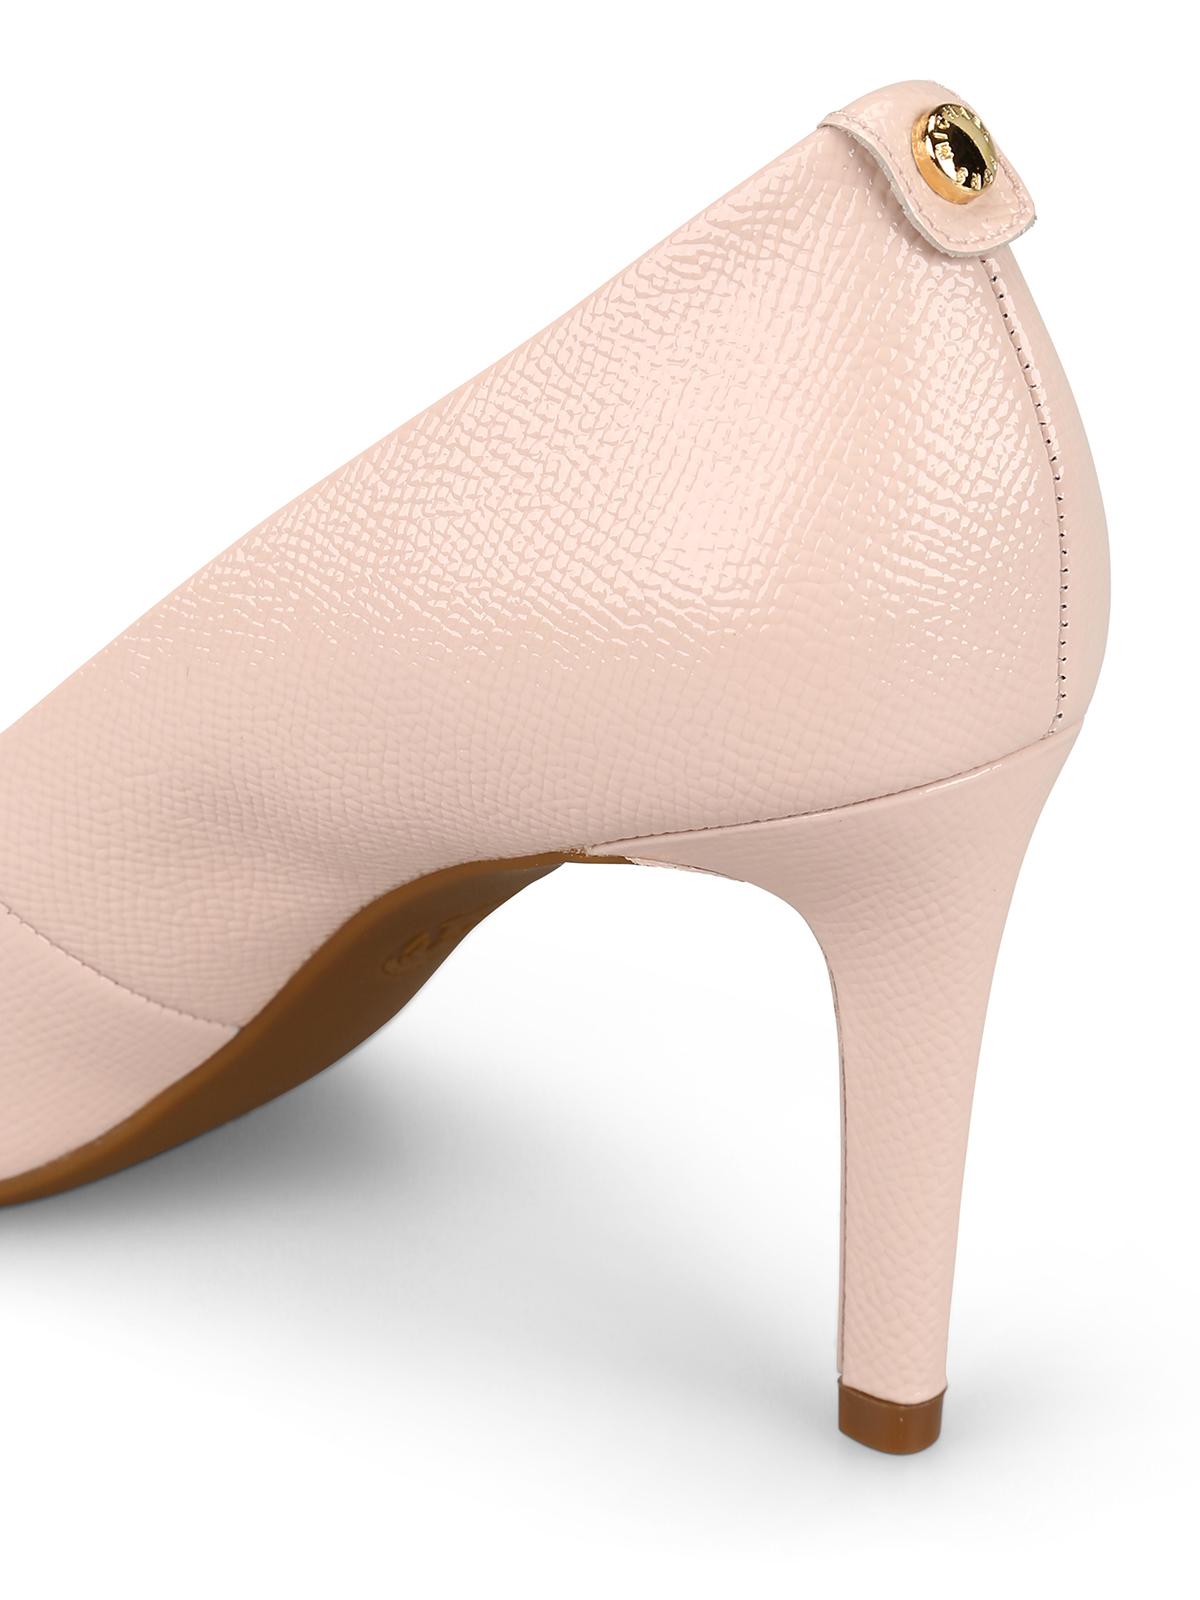 michael kors pink high heels